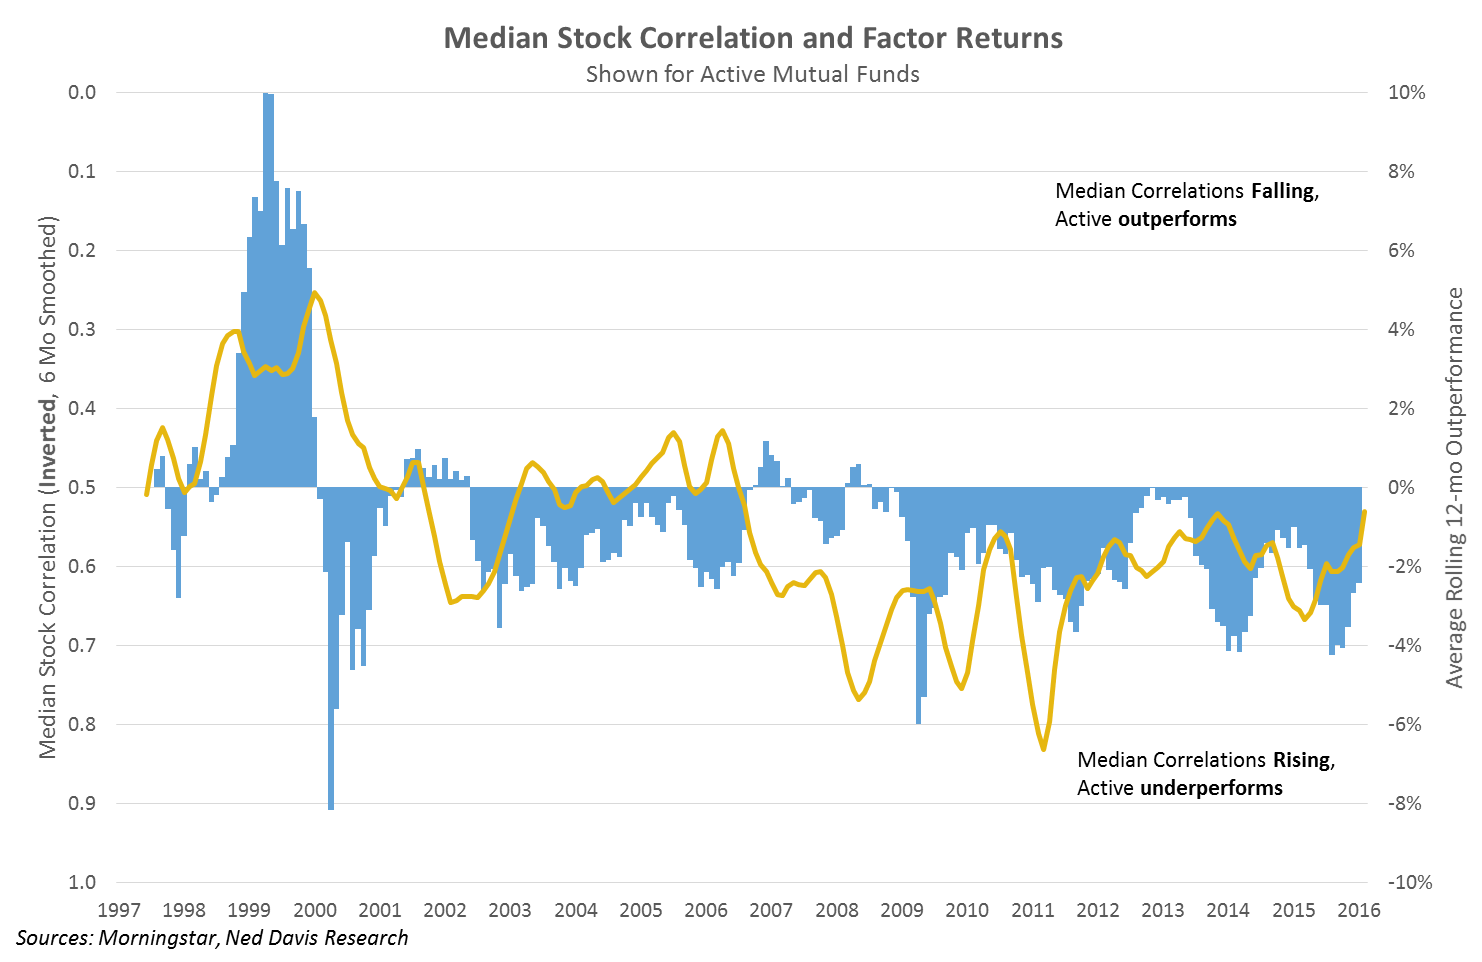 chart-3-median-stock-correlation-and-factor-returns